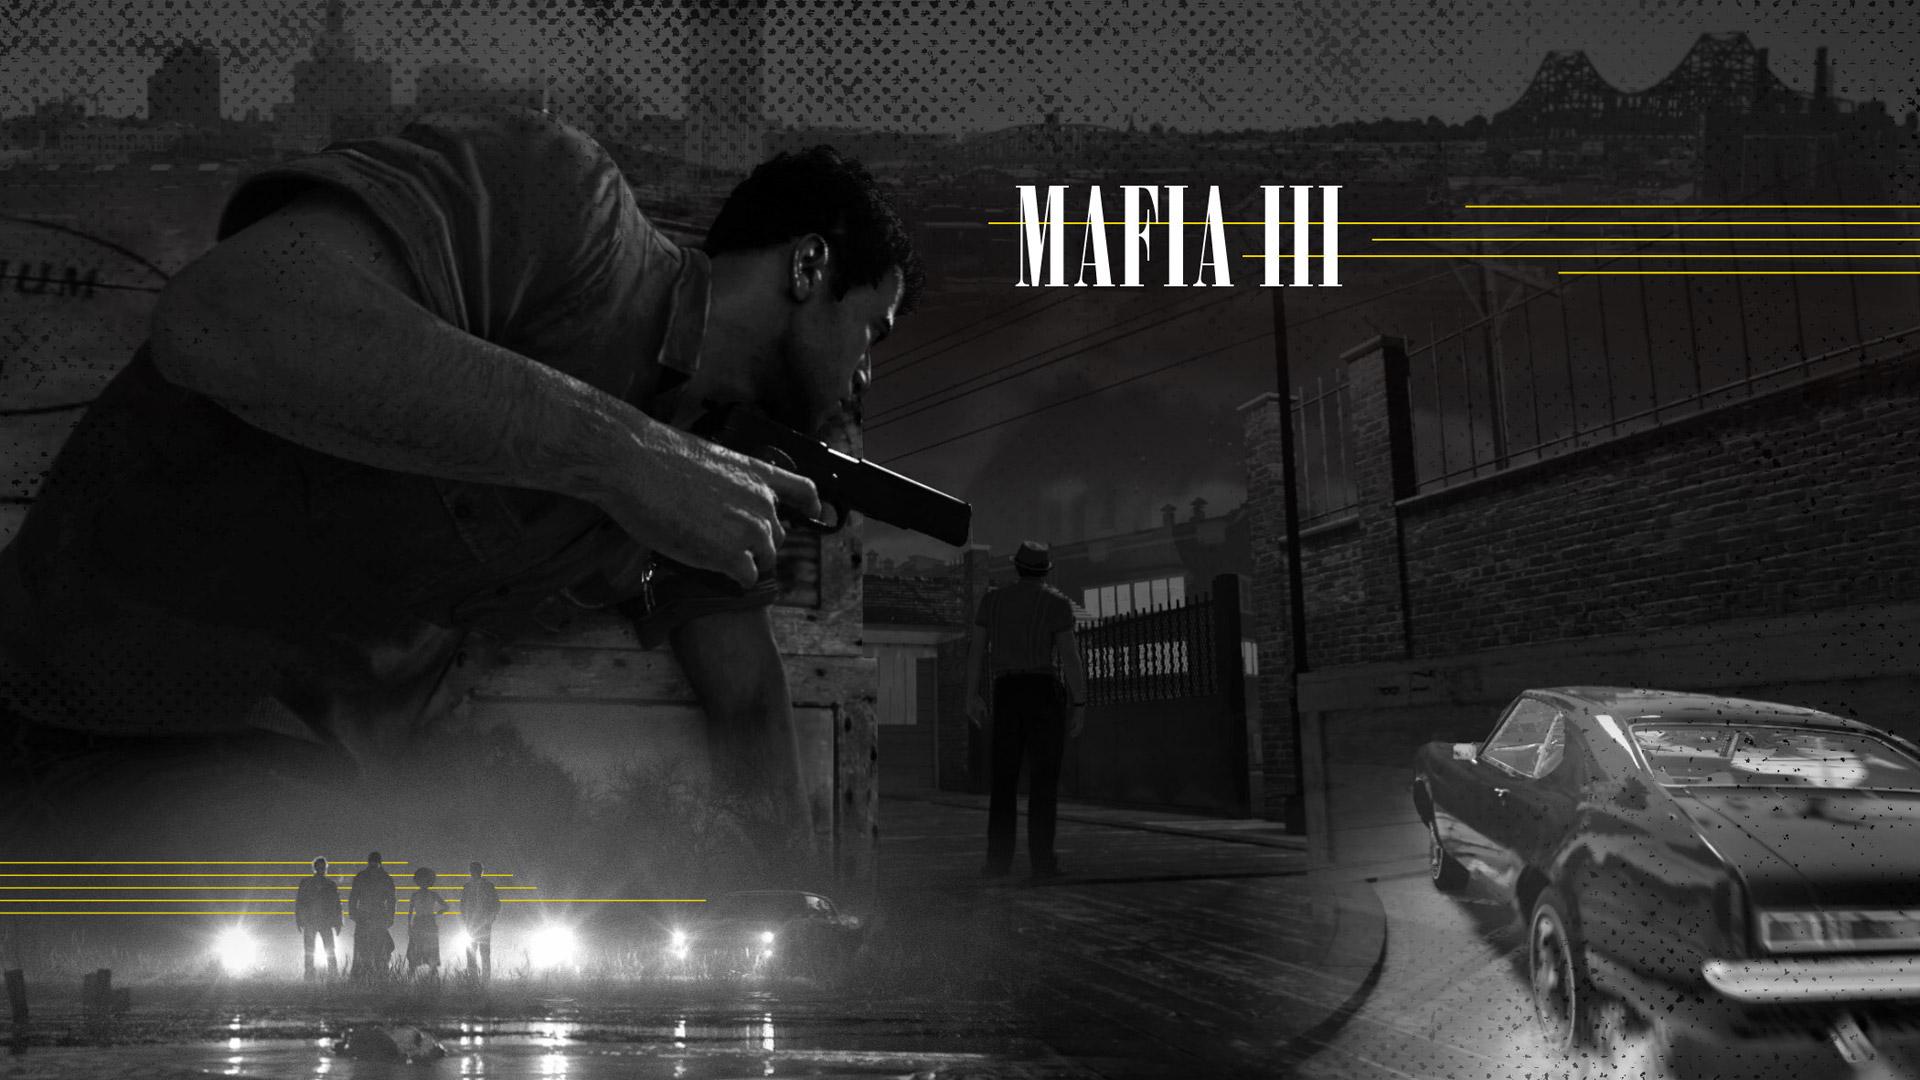 Free Mafia III Wallpaper in 1920x1080